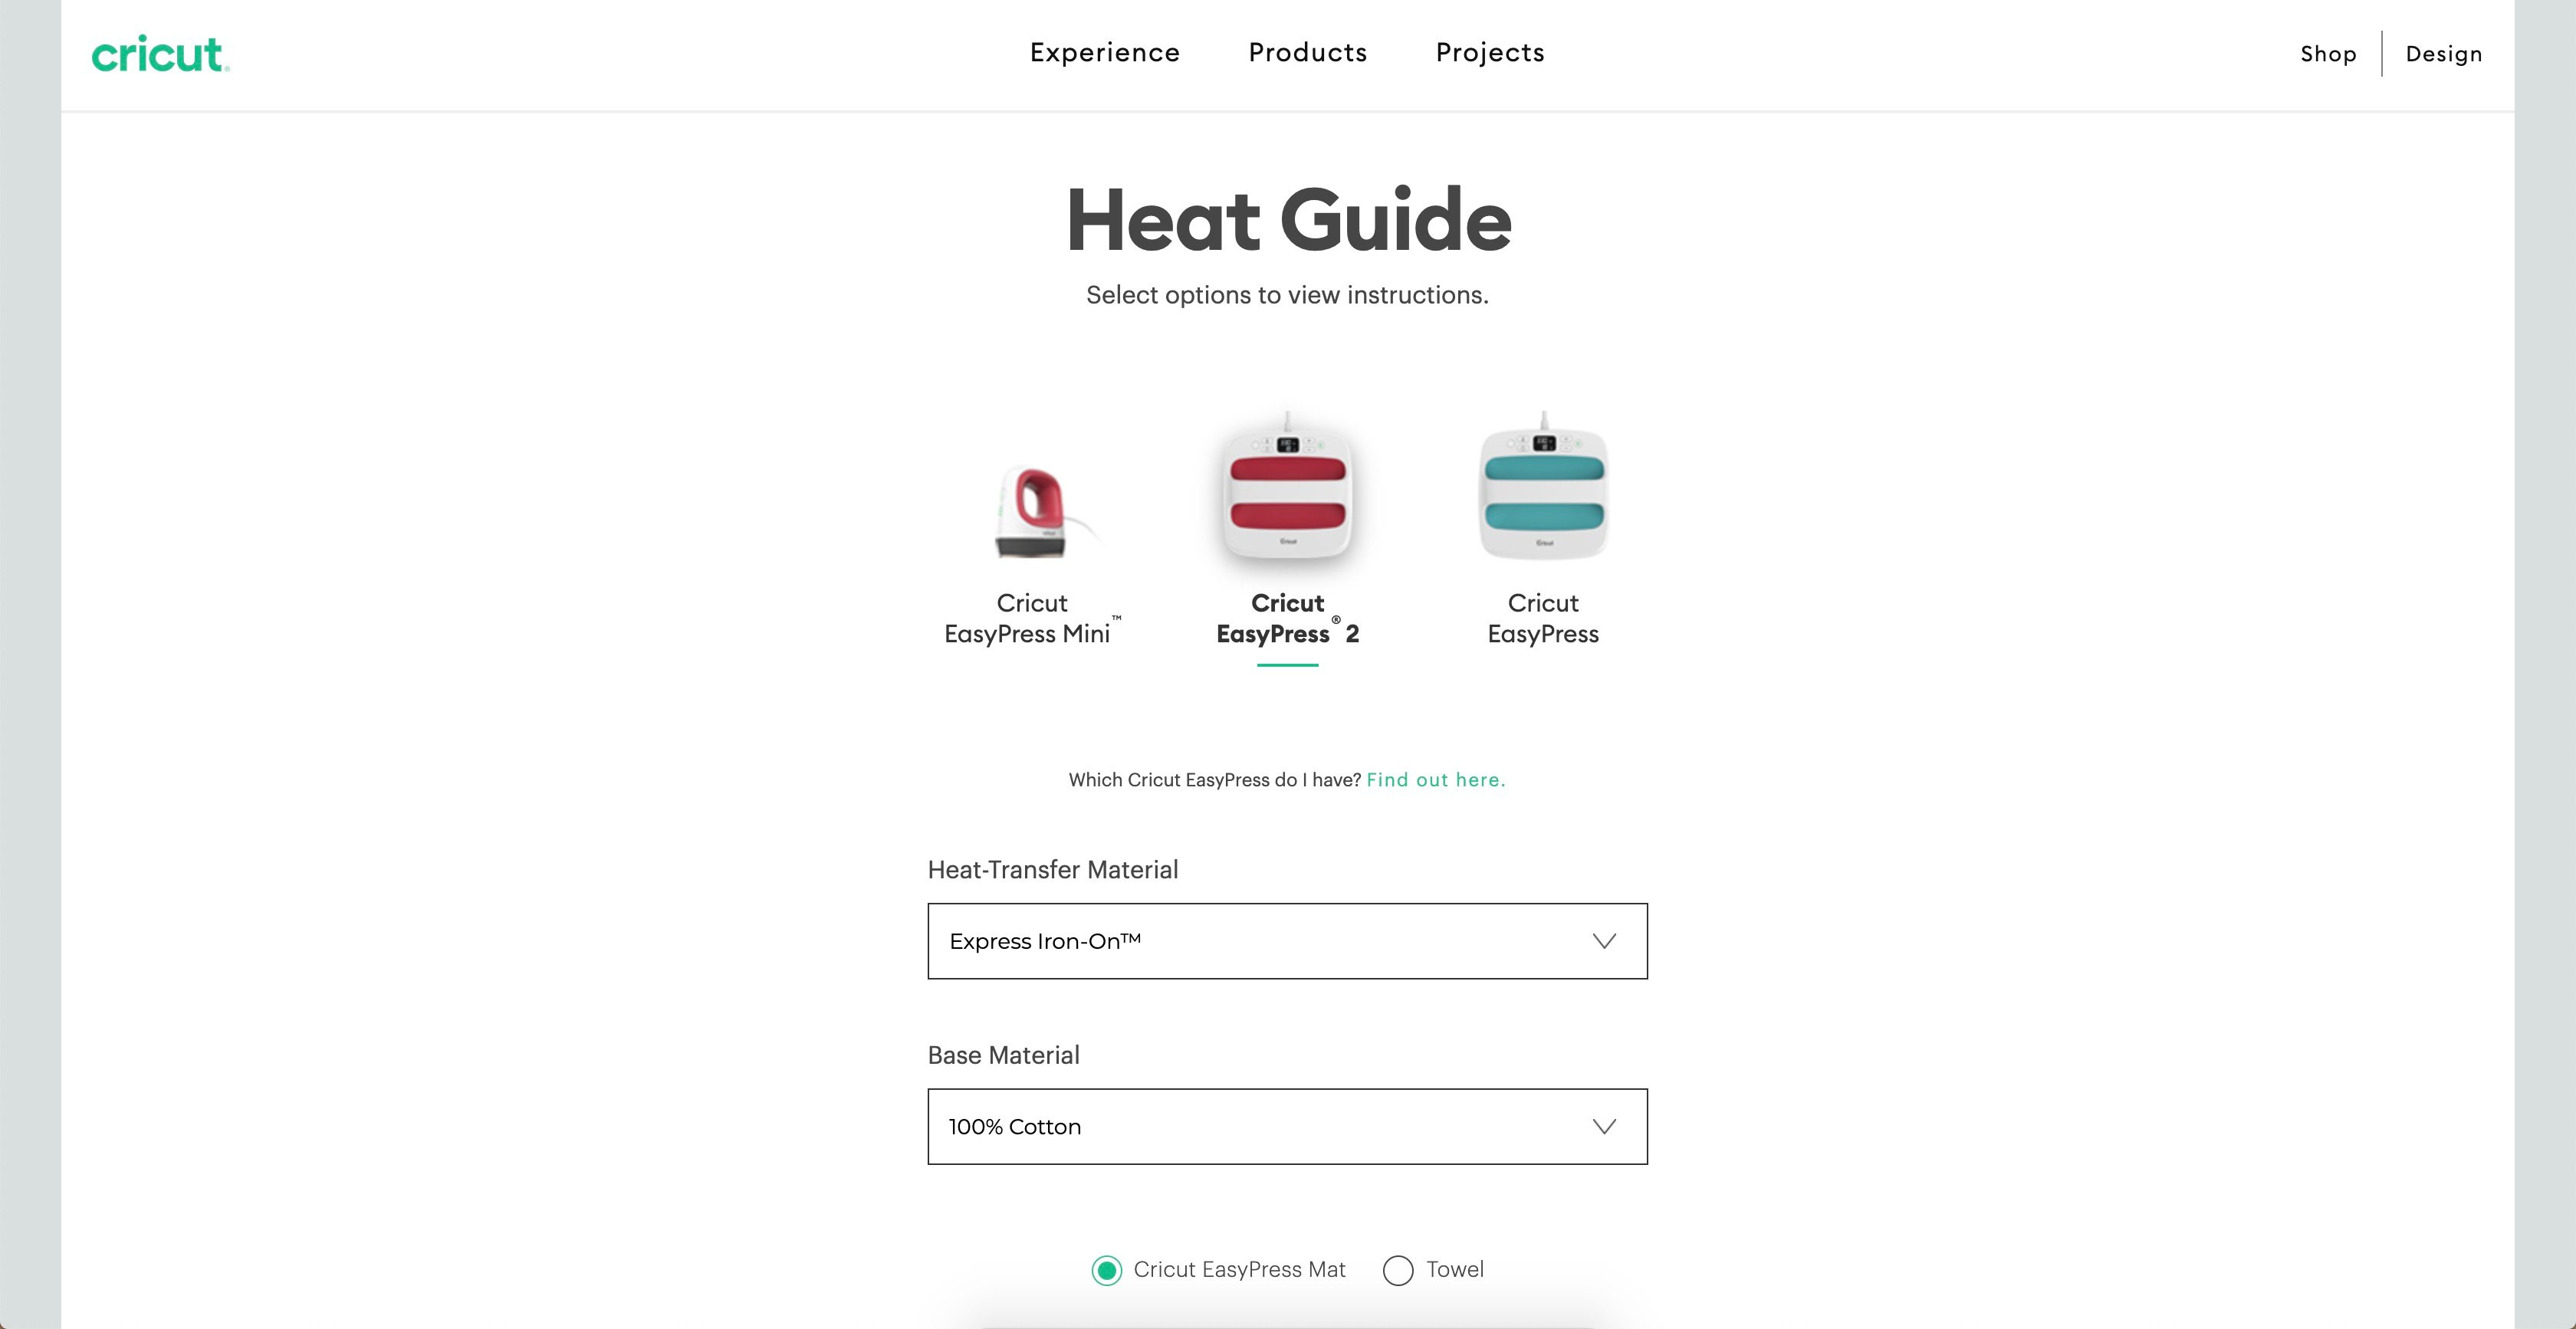 how to make a custom shirt with cricut heat guide